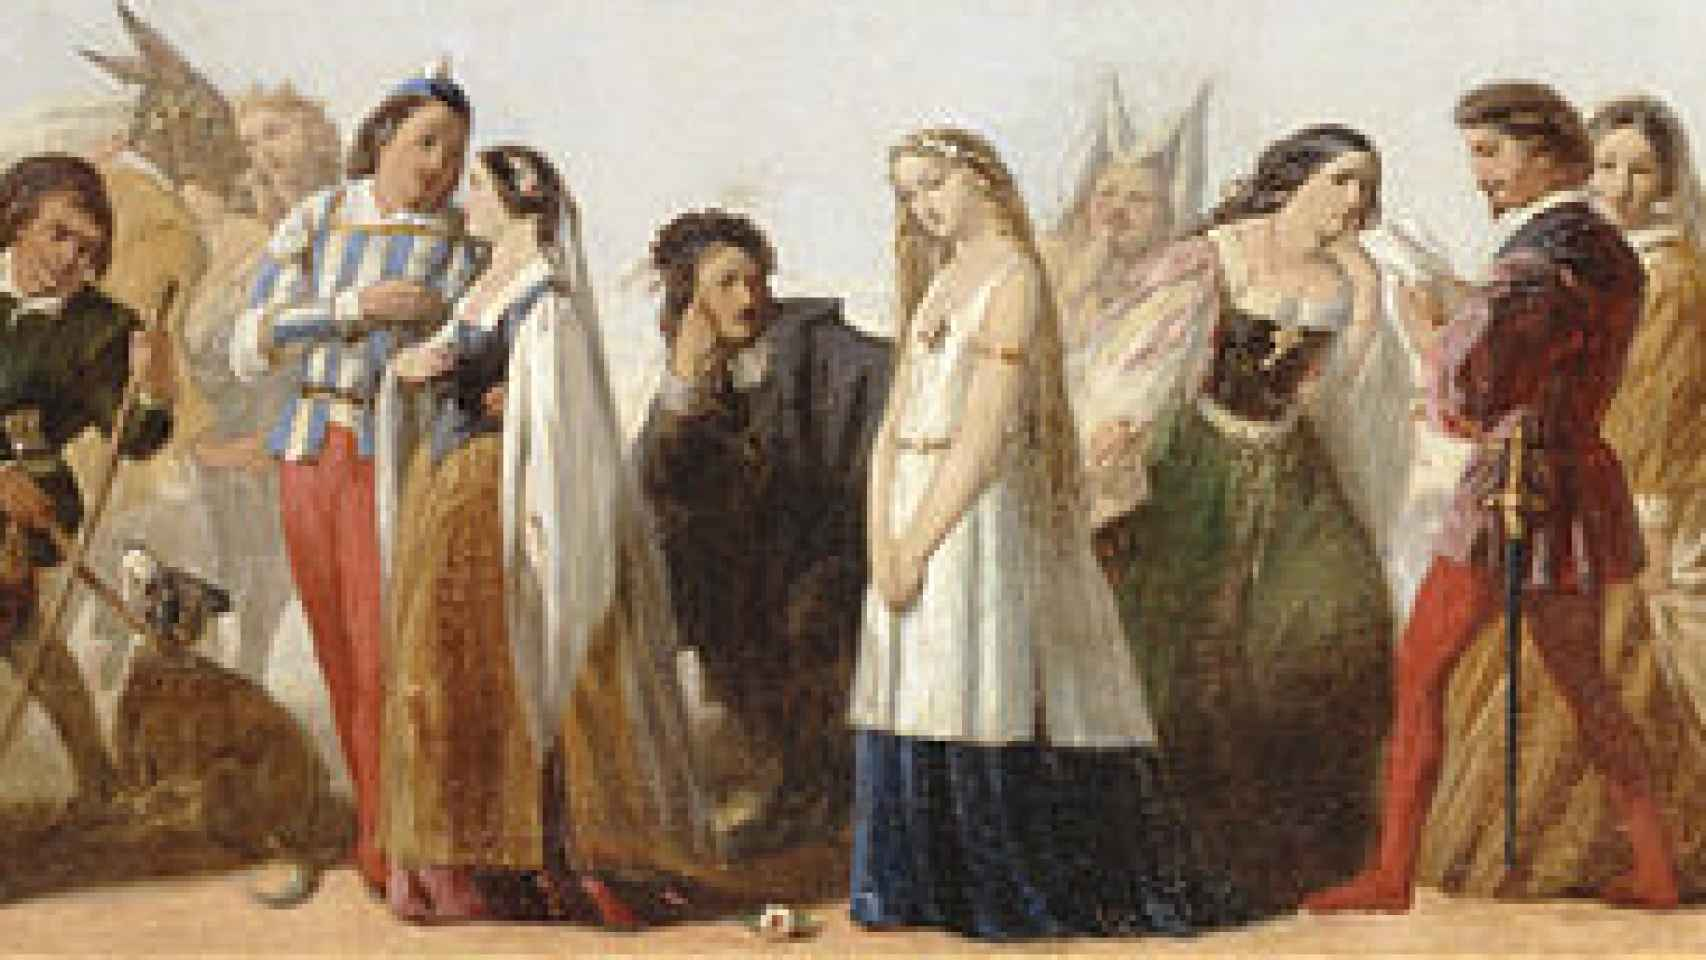 Desfile de personas de Shakespeare, obra de artista desconocido.